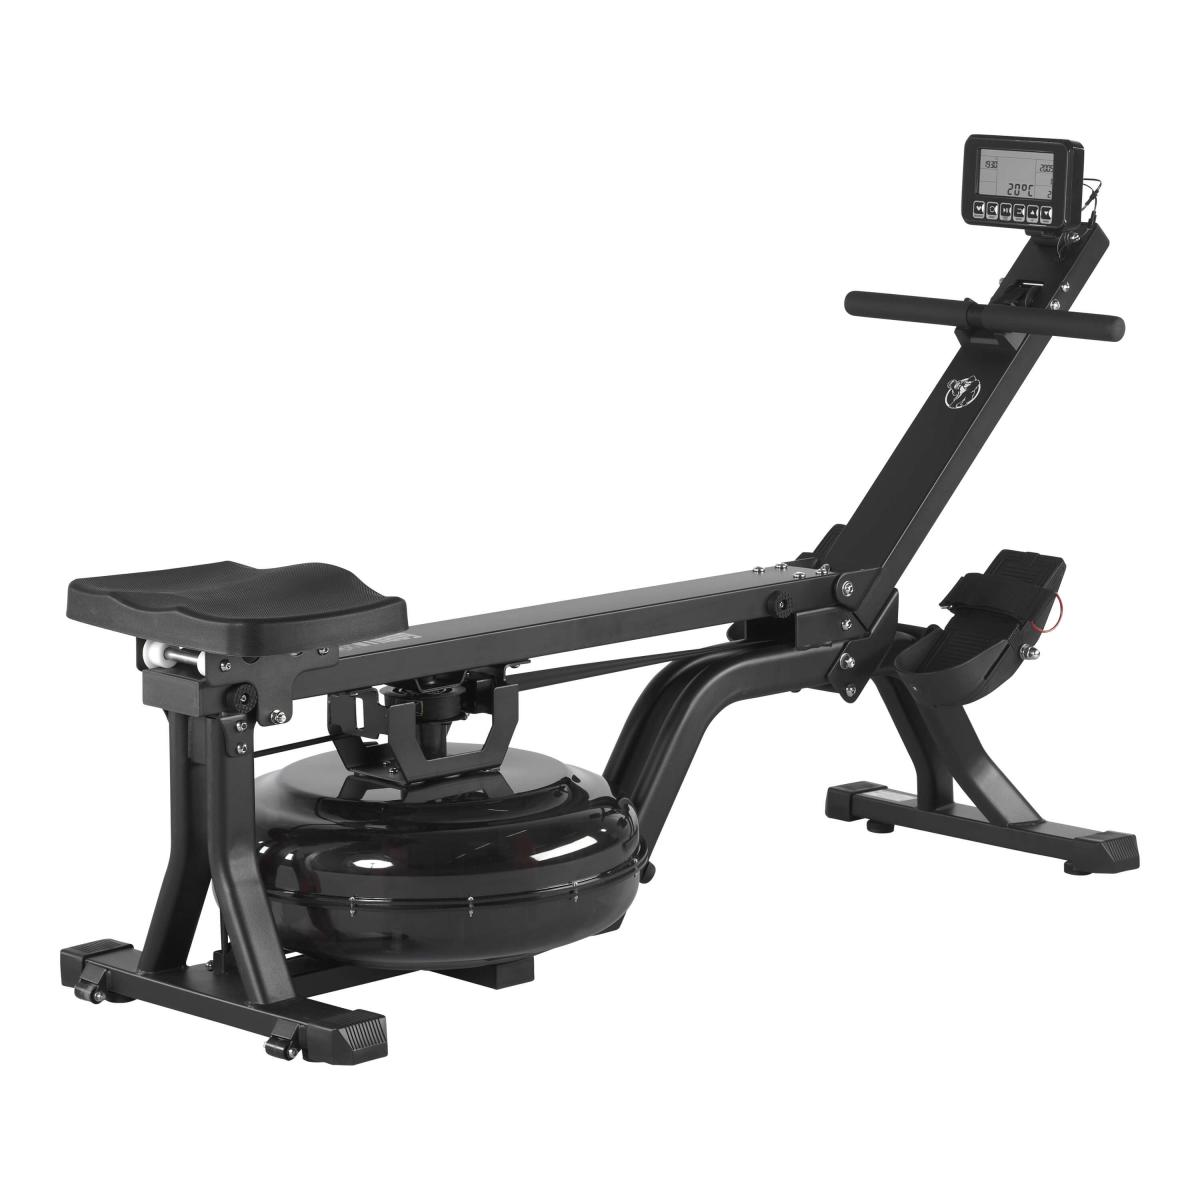 Gorilla Sports Wasserrudergerät mit Trainingscomputer Schwarz/Rot 101115-00019-0001